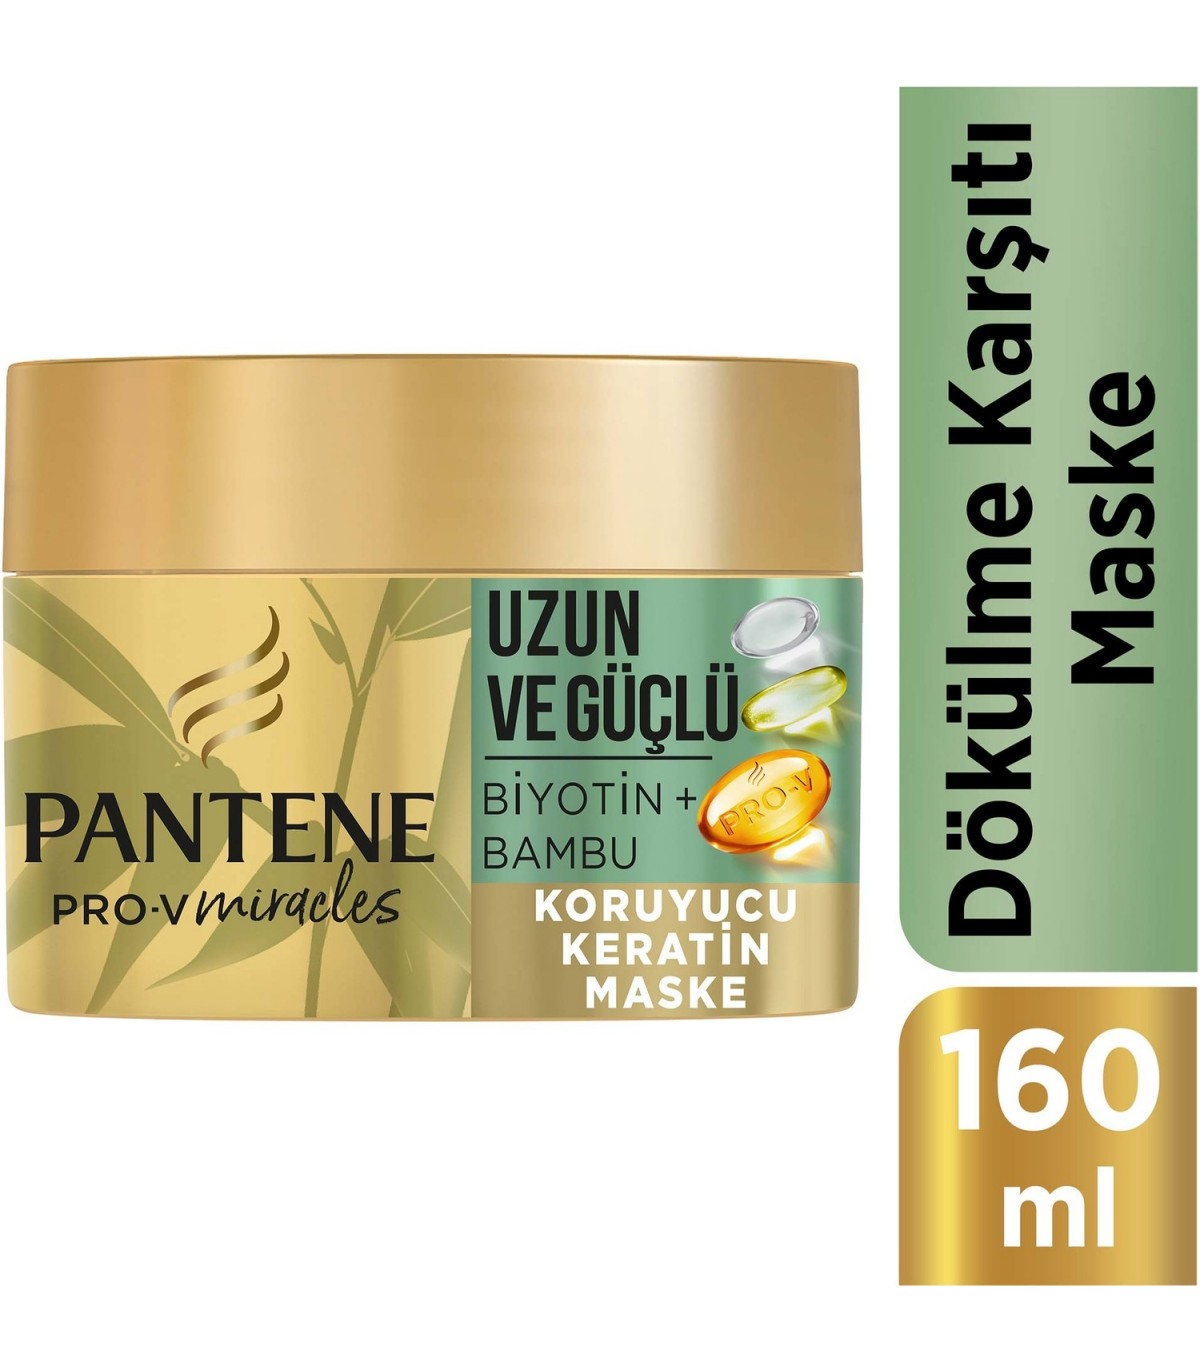 Pantene ماسک مو بیوتین و بامبو 160 میلی پنتن